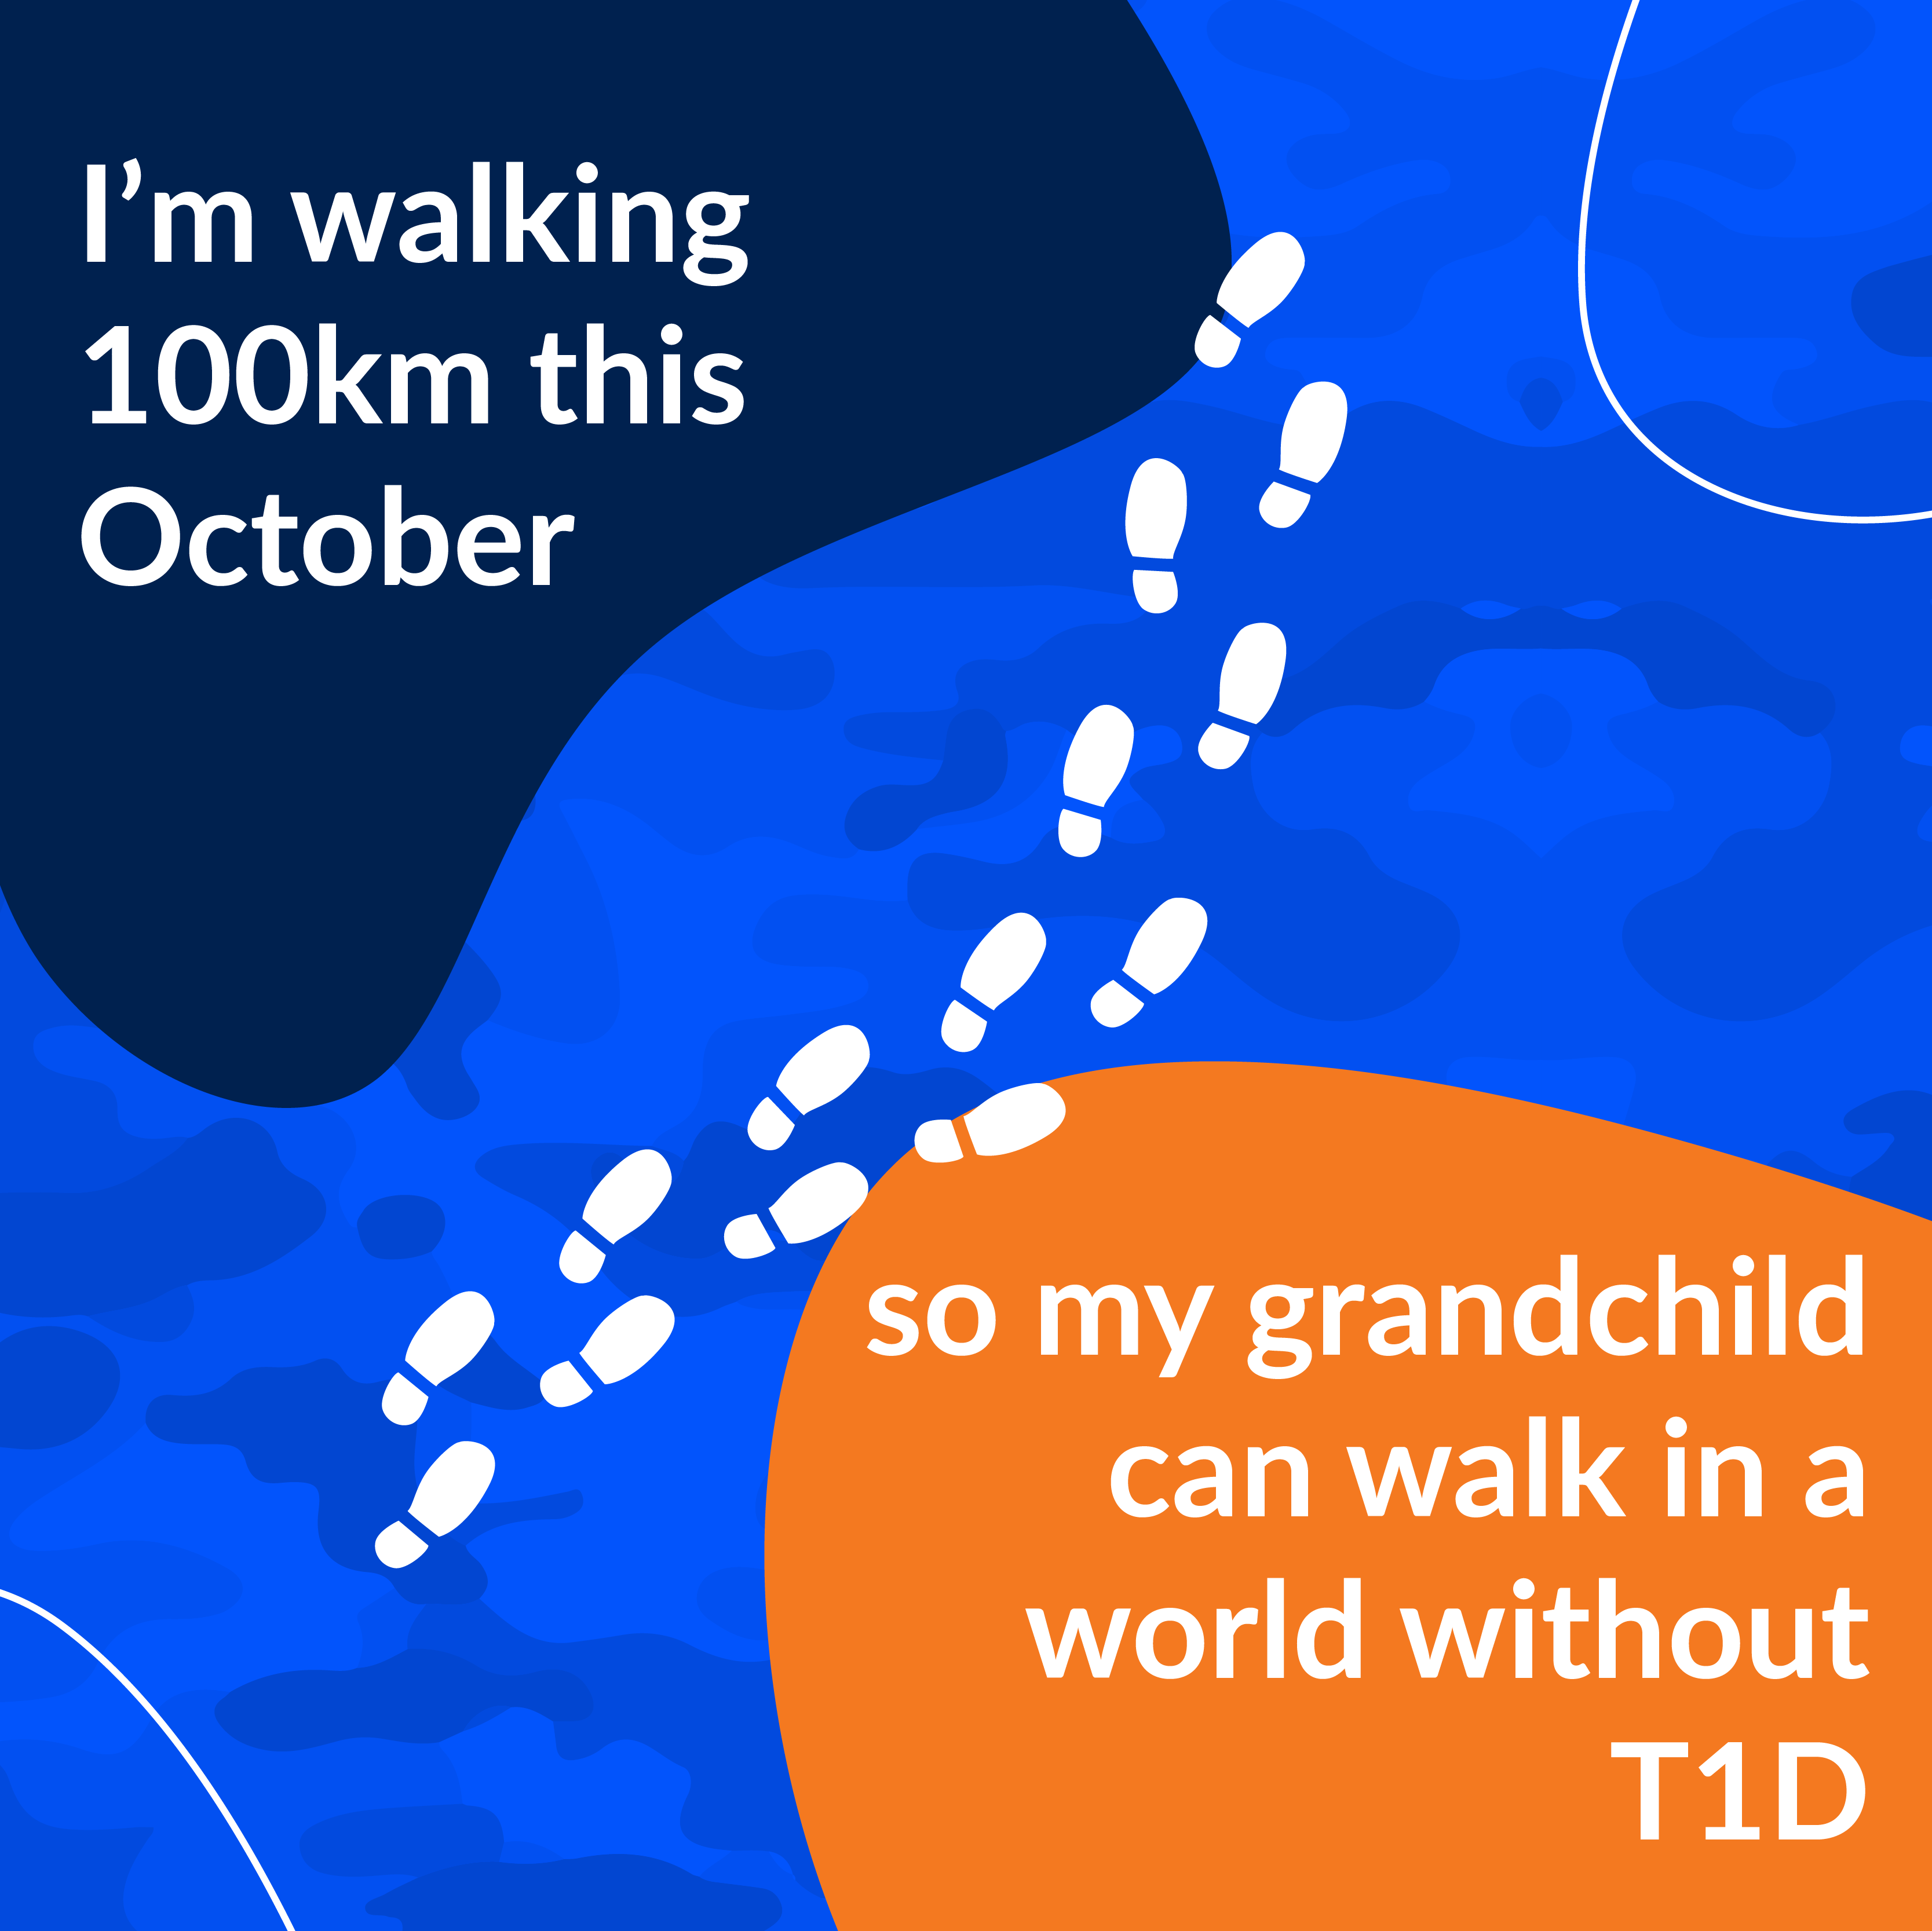 Walking for my grandchild